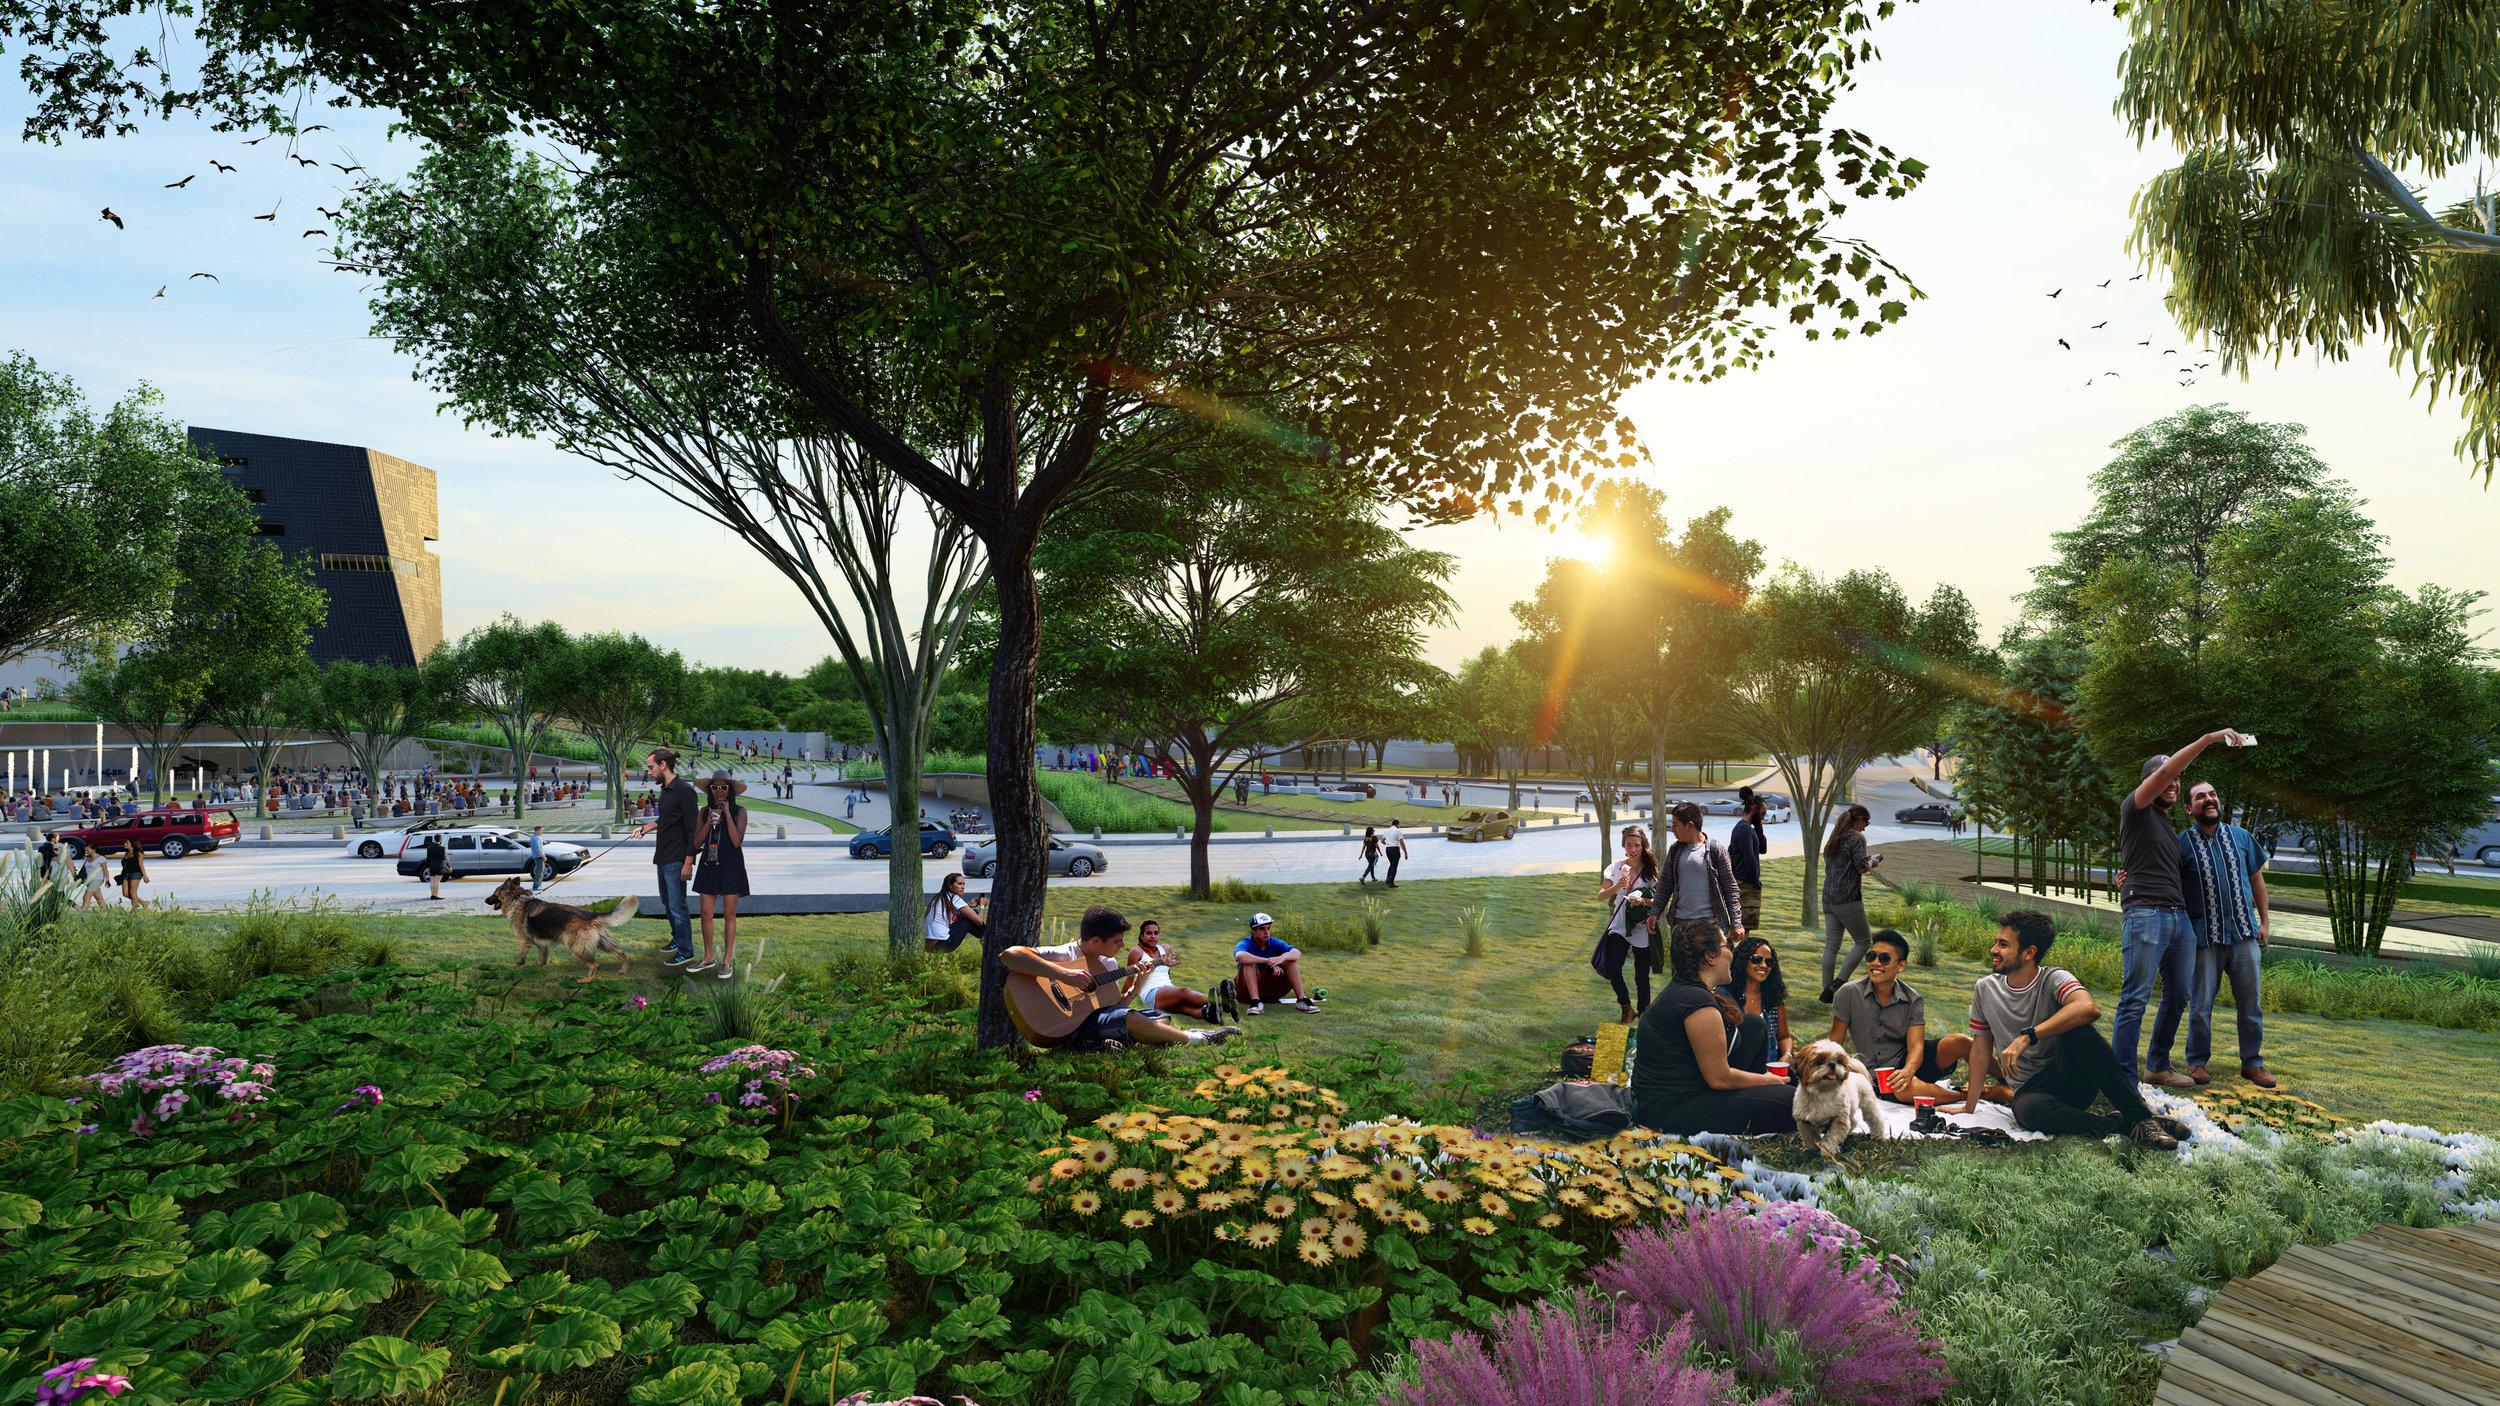 Vista 04_Parque 02.jpg